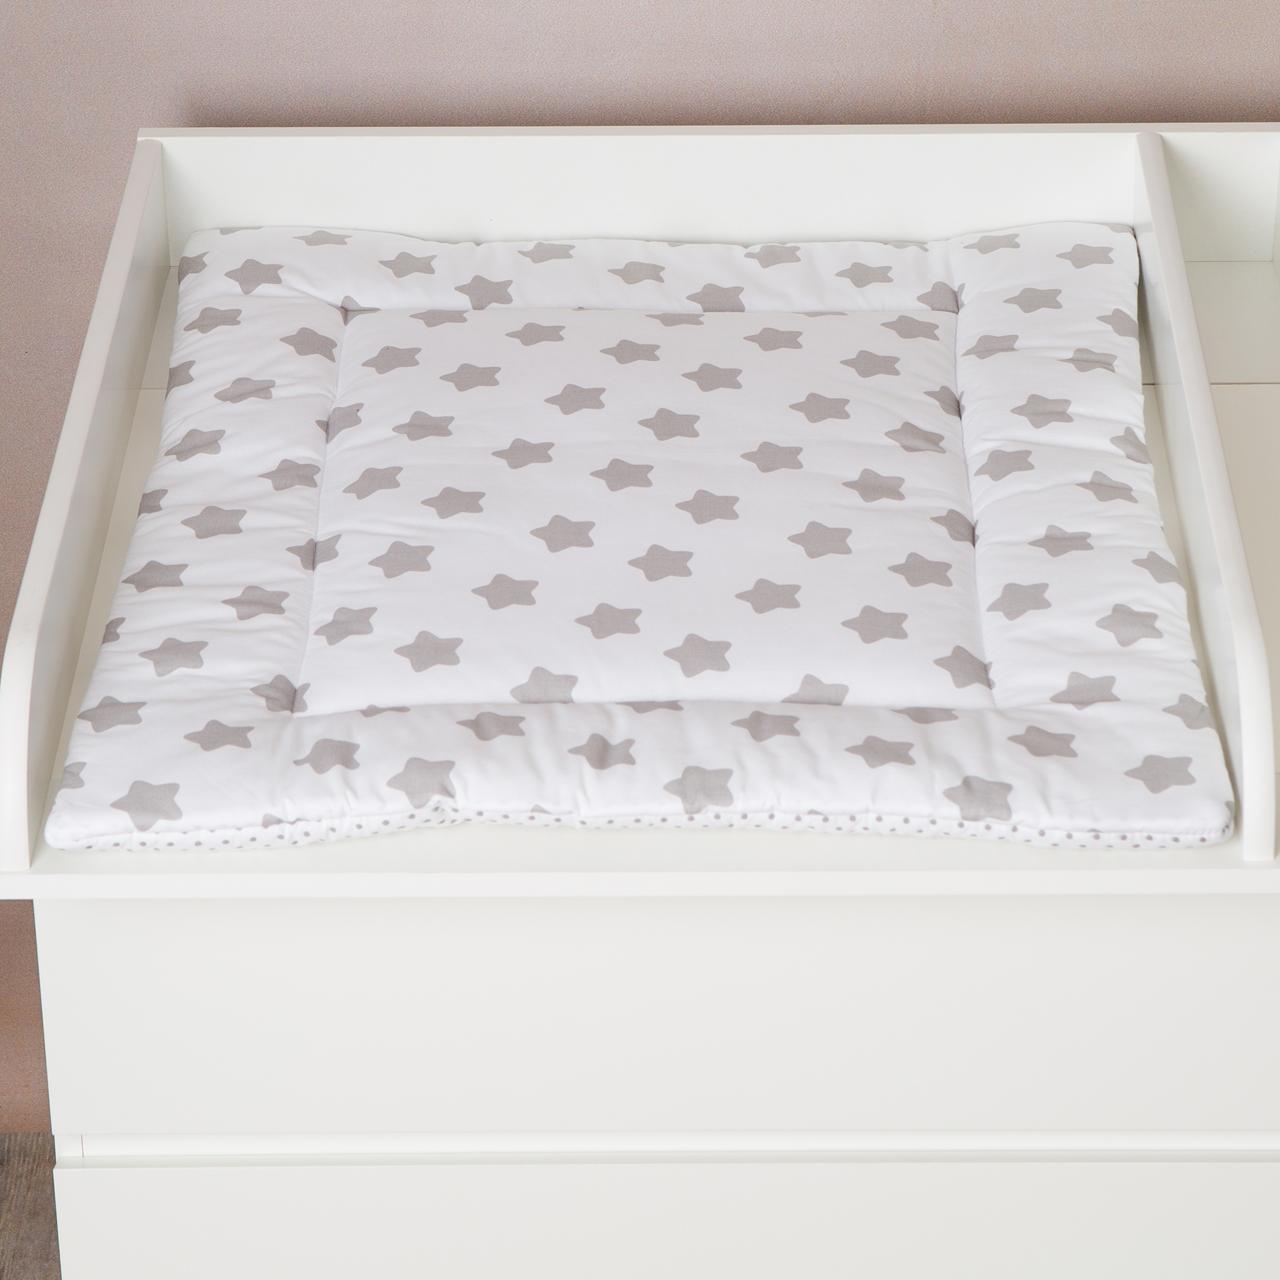 wickelauflagen puckdaddy wickelaufs tze f r deine ikea kommode. Black Bedroom Furniture Sets. Home Design Ideas